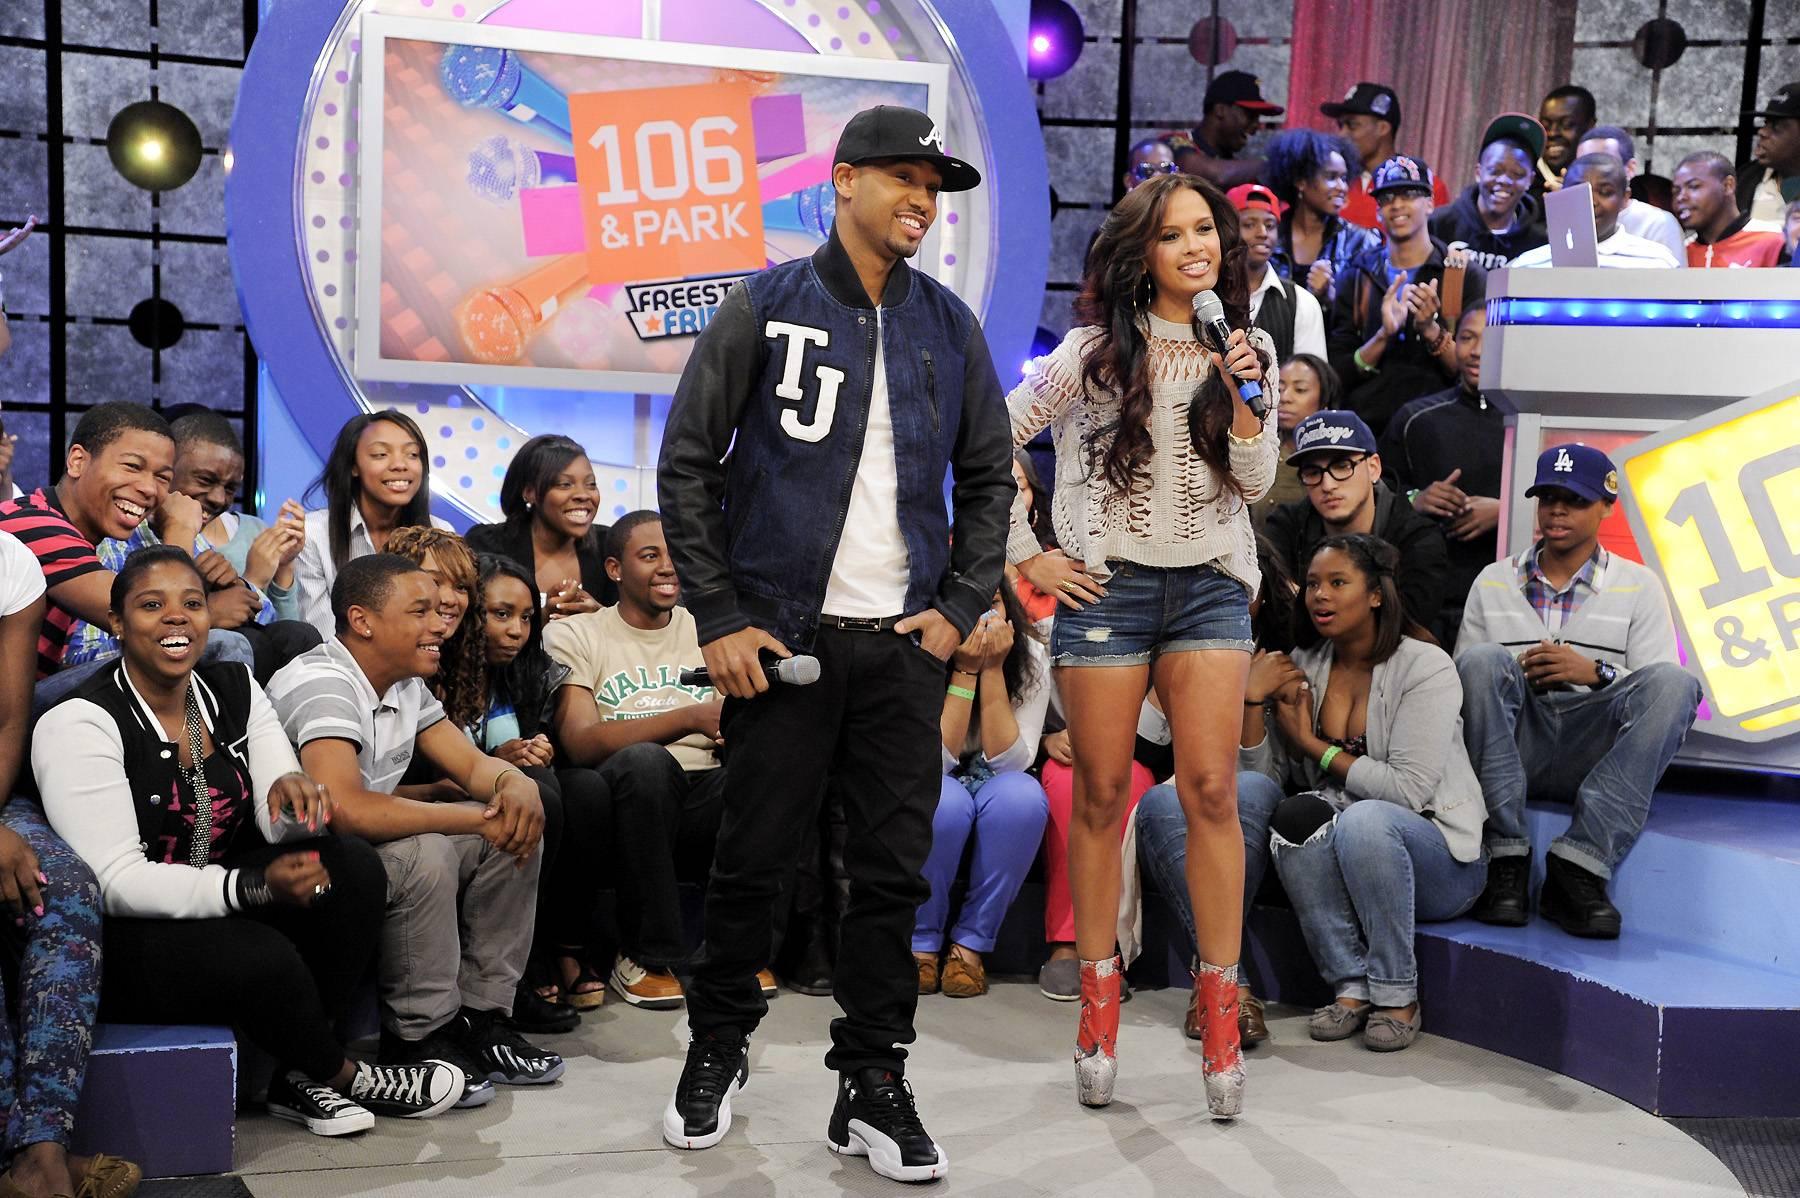 Let's Go - Terrence J and Rocsi Diaz at 106 & Park, April 6, 2012. (photo: John Ricard / BET)